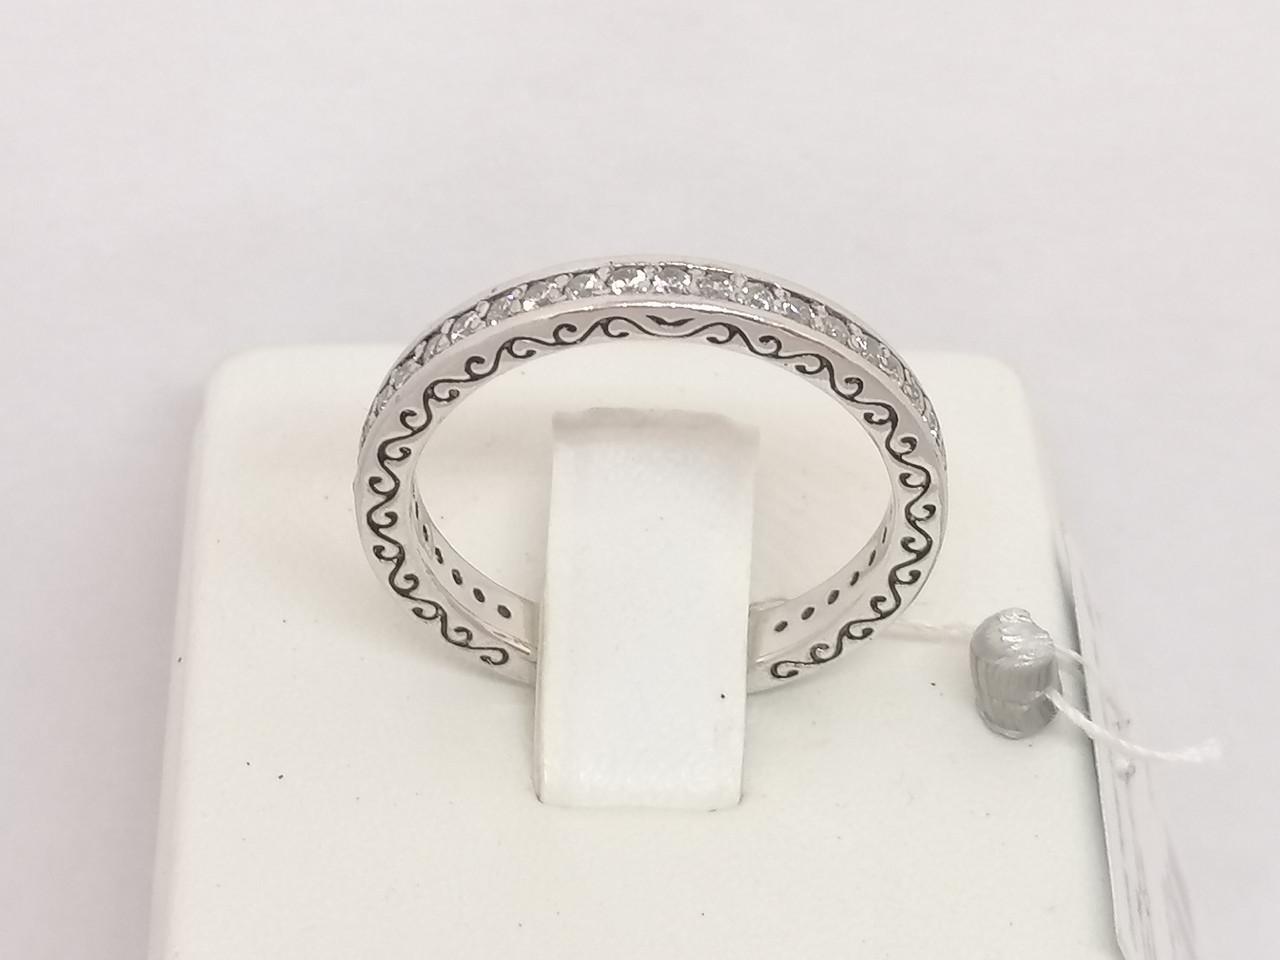 Серебряное кольцо с фианитами. Артикул 3212691401 18,5